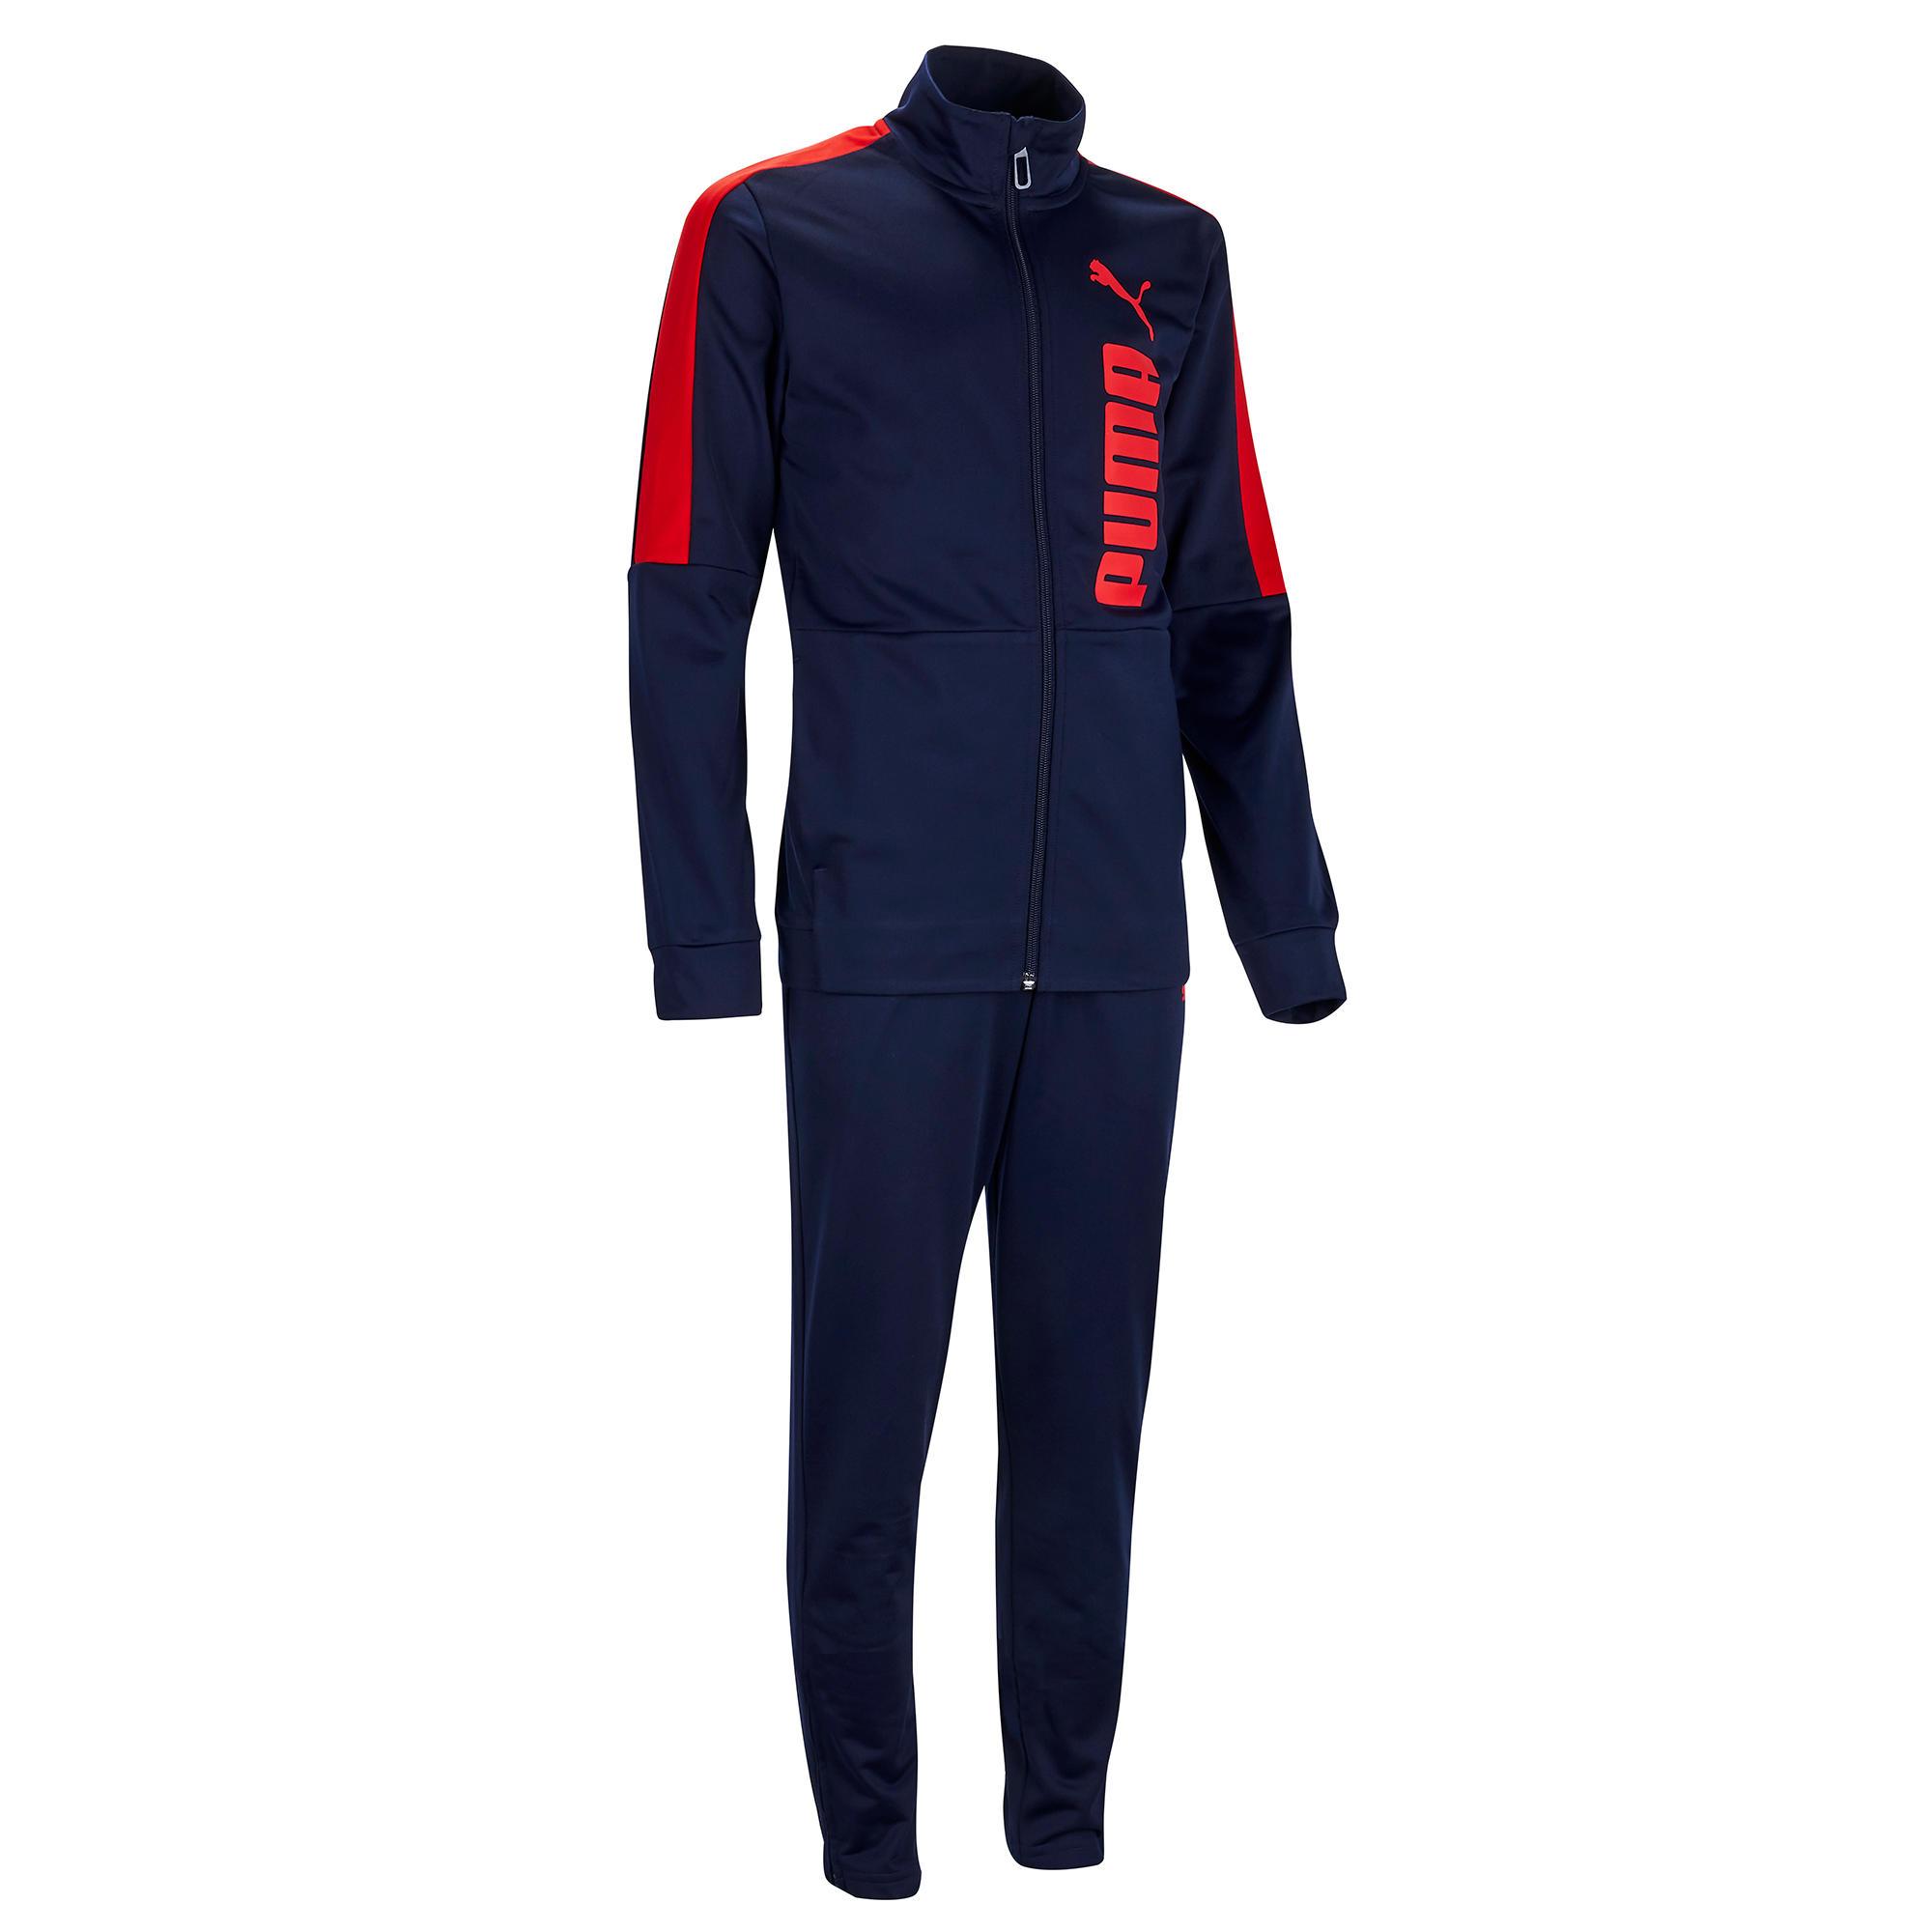 be23034c37a2 Comprar Ropa de Niño Fitness Online | Decathlon